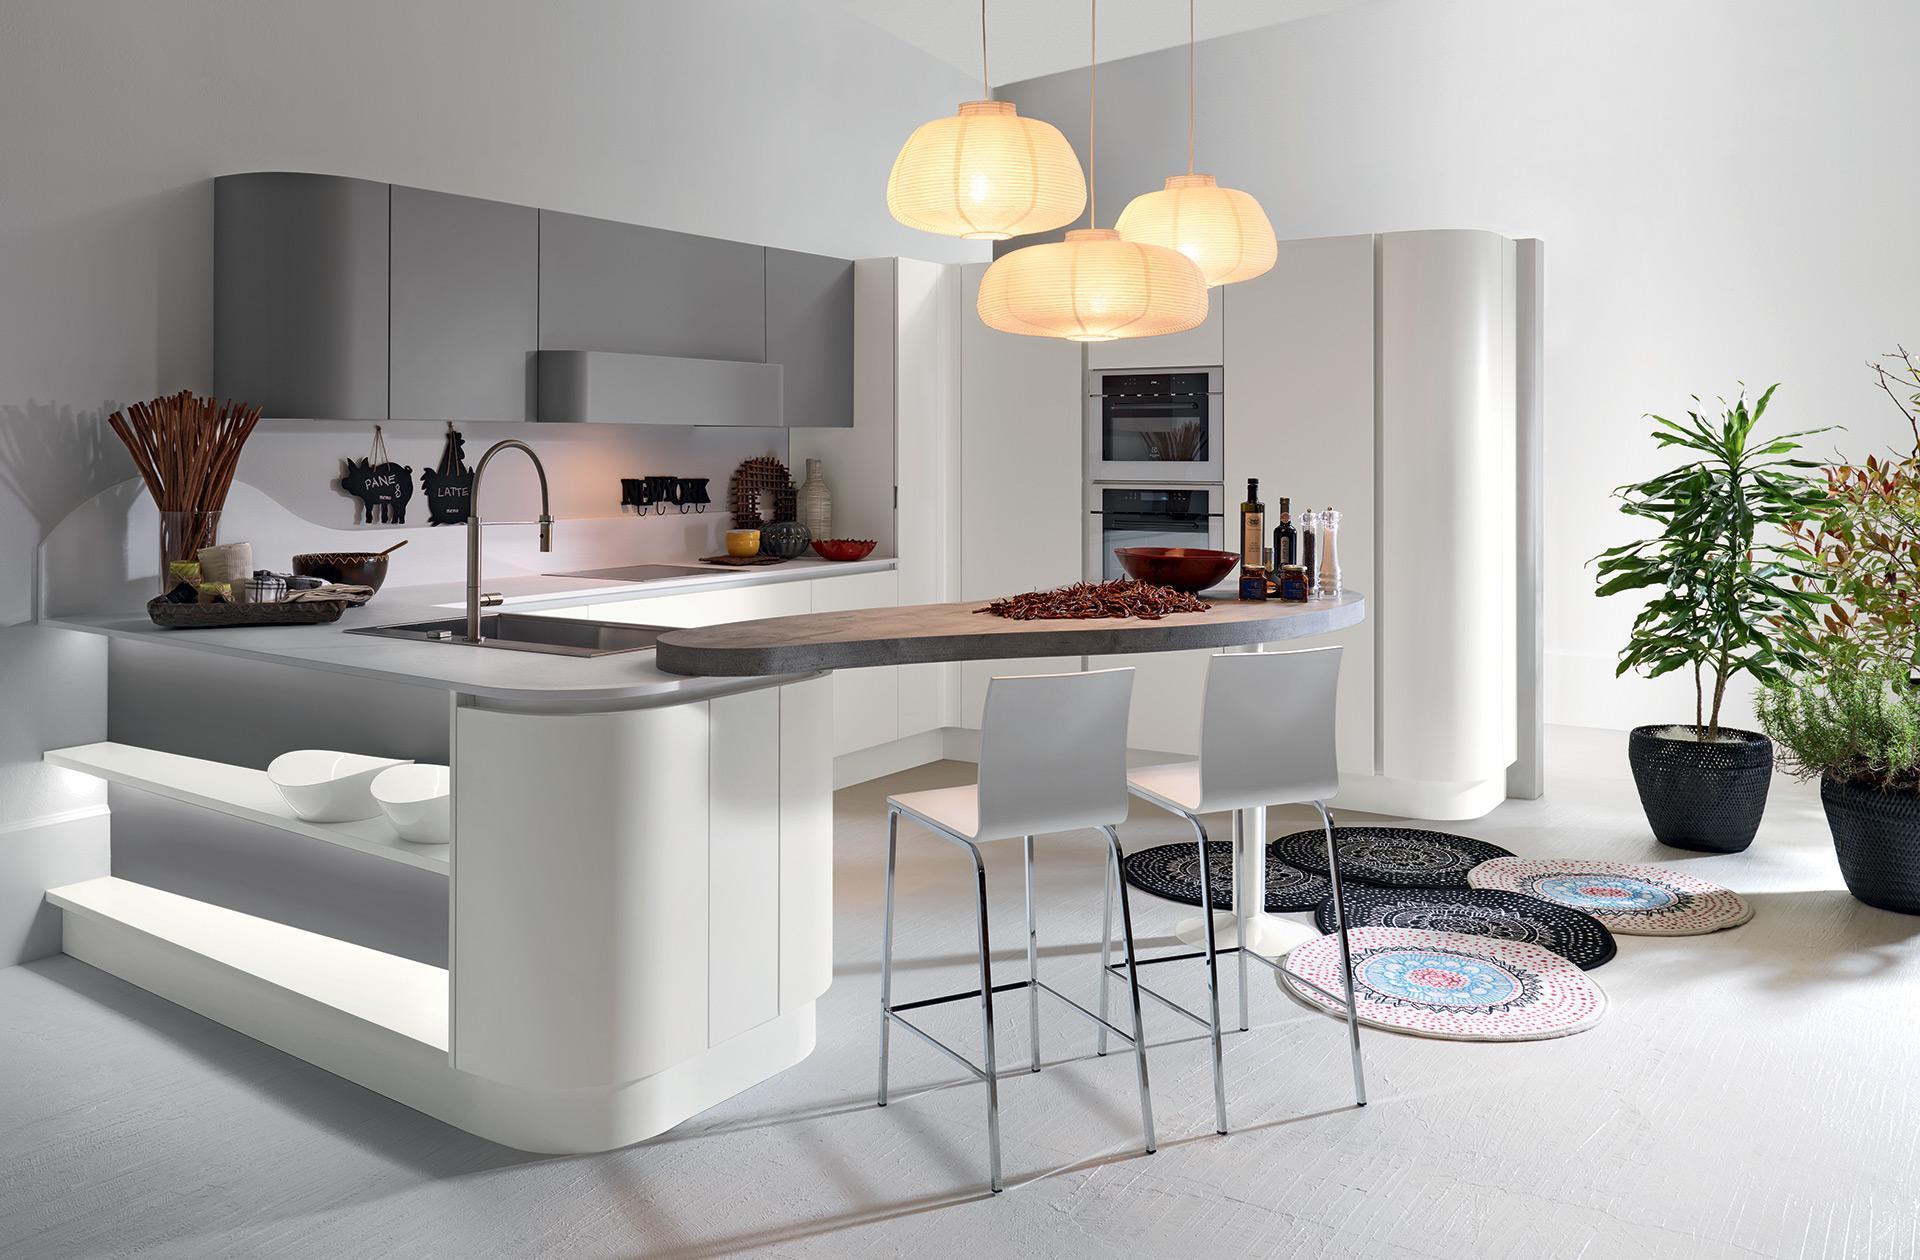 Mobili cucina moderna simple dispensa cucina moderna with for Mobili riccelli